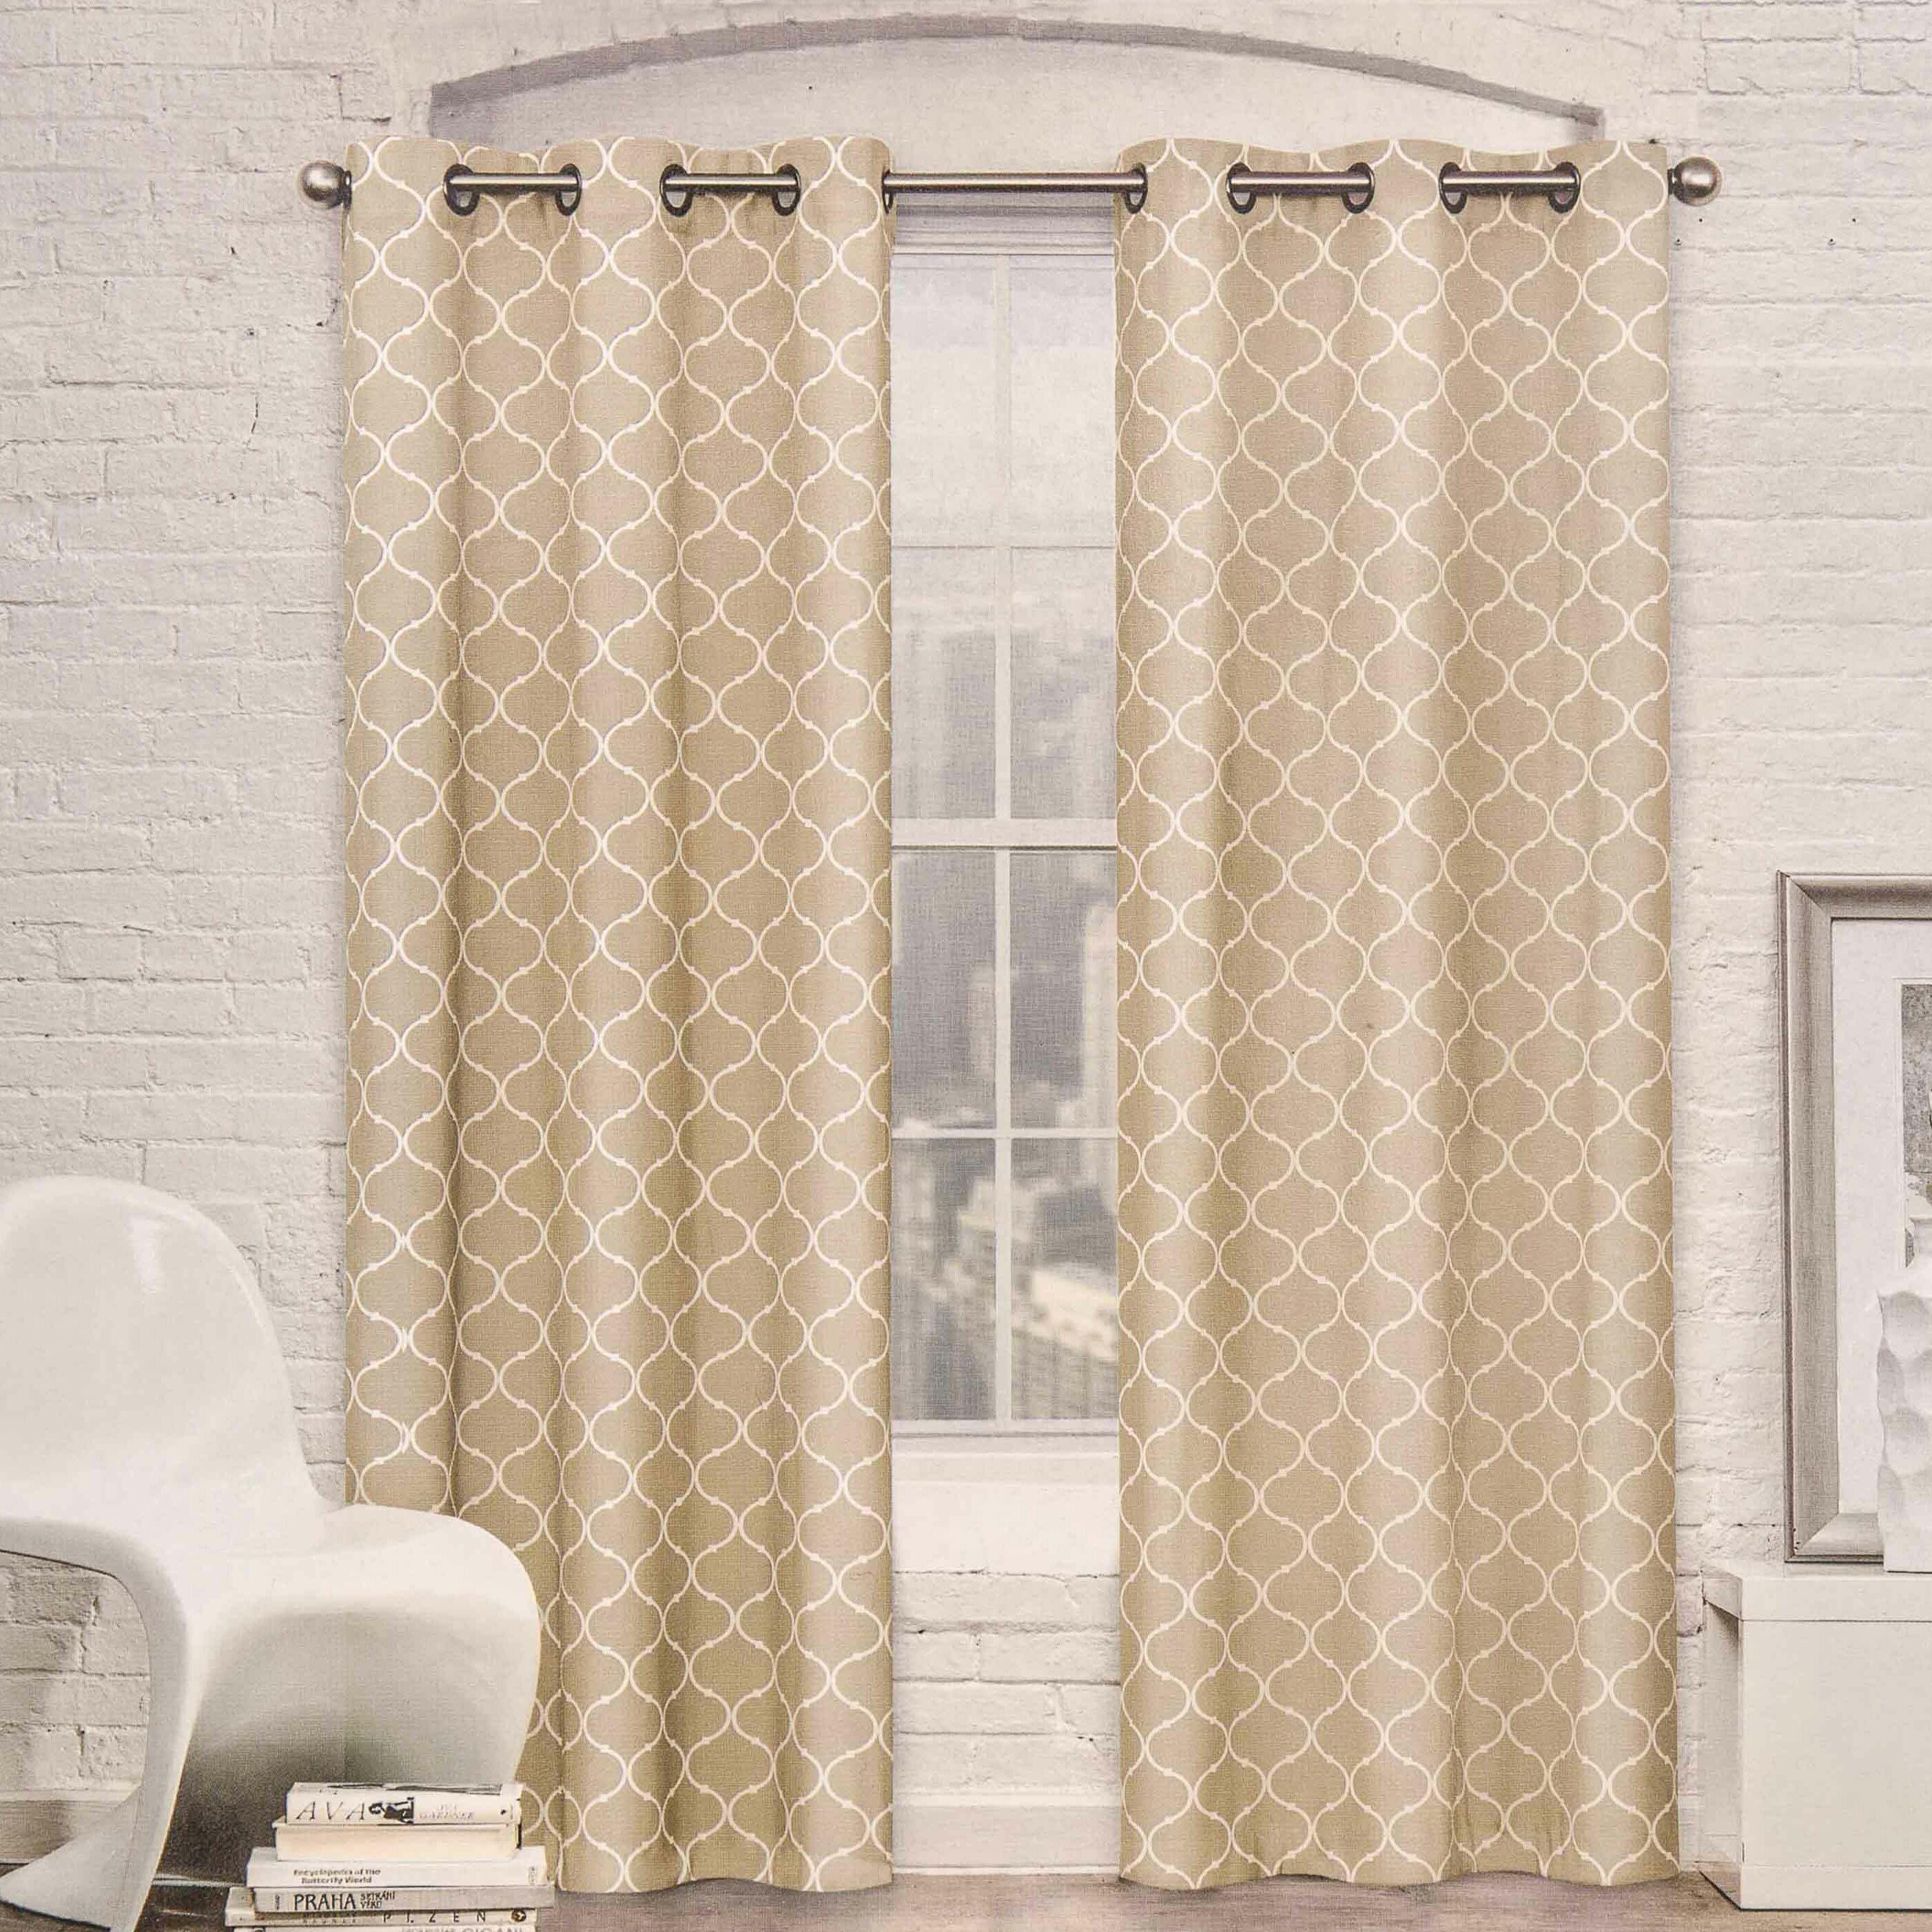 Curtain room dividers - Crover Moroccan Trellis Room Darkening Curtain Panel Amp Reviews